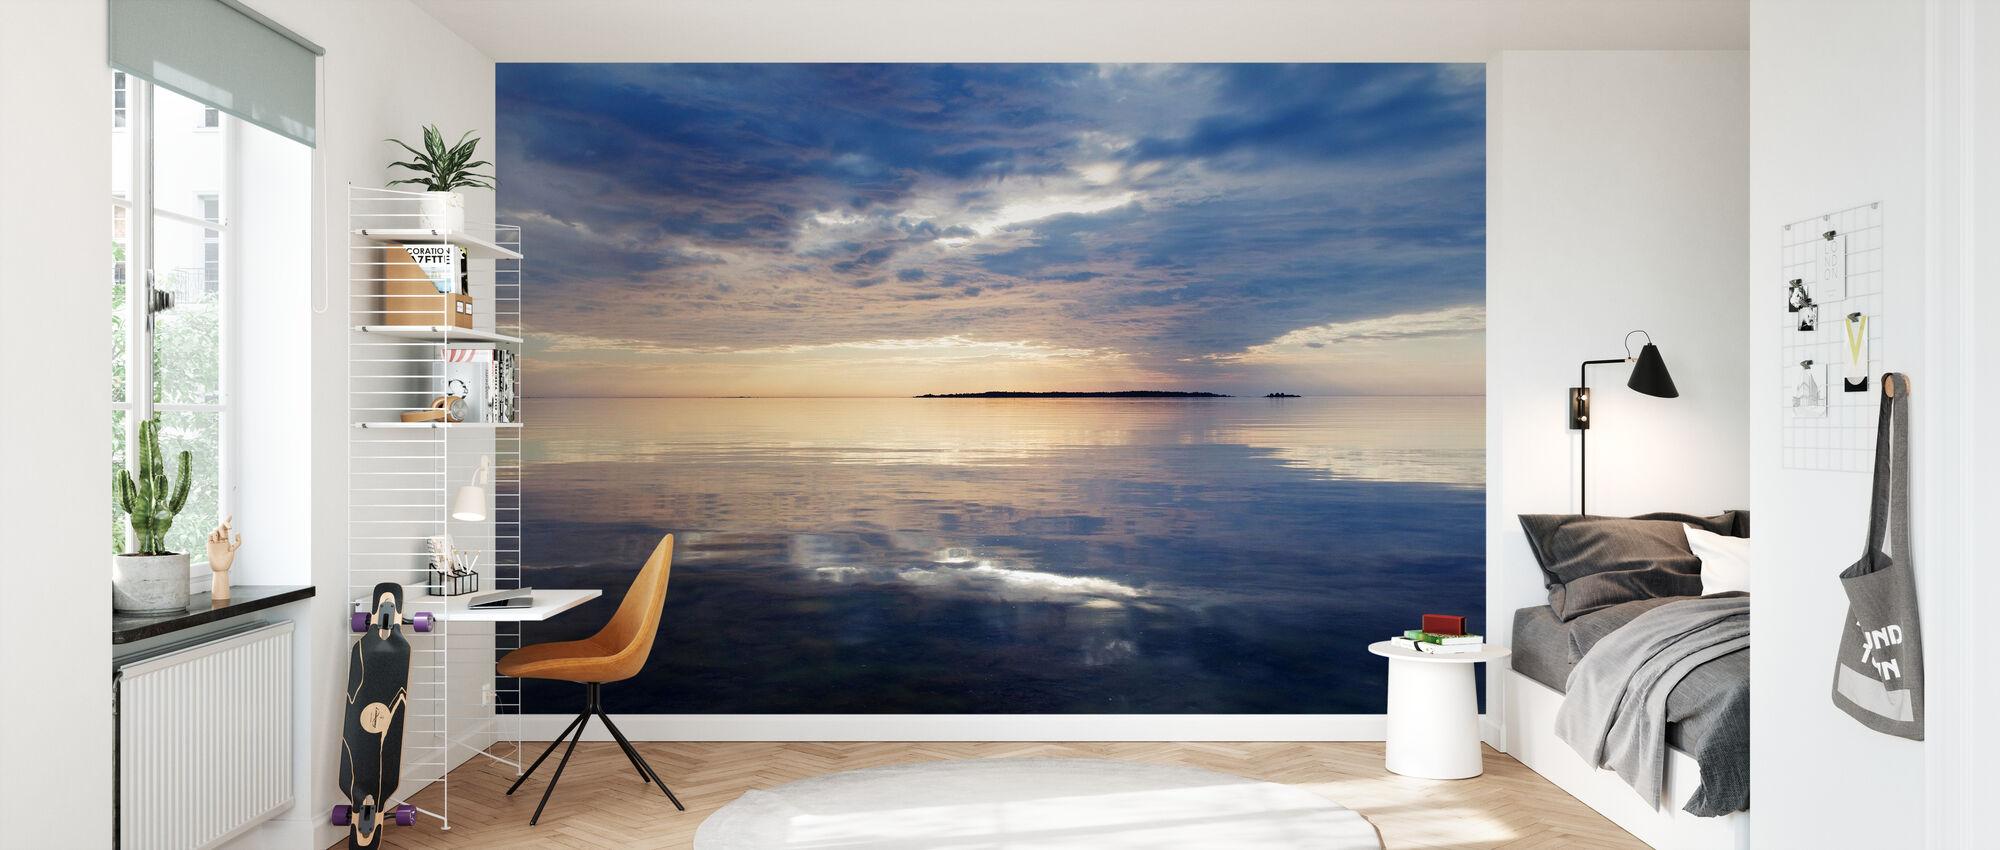 Sky Mirrored in Baltic Sea - Wallpaper - Kids Room